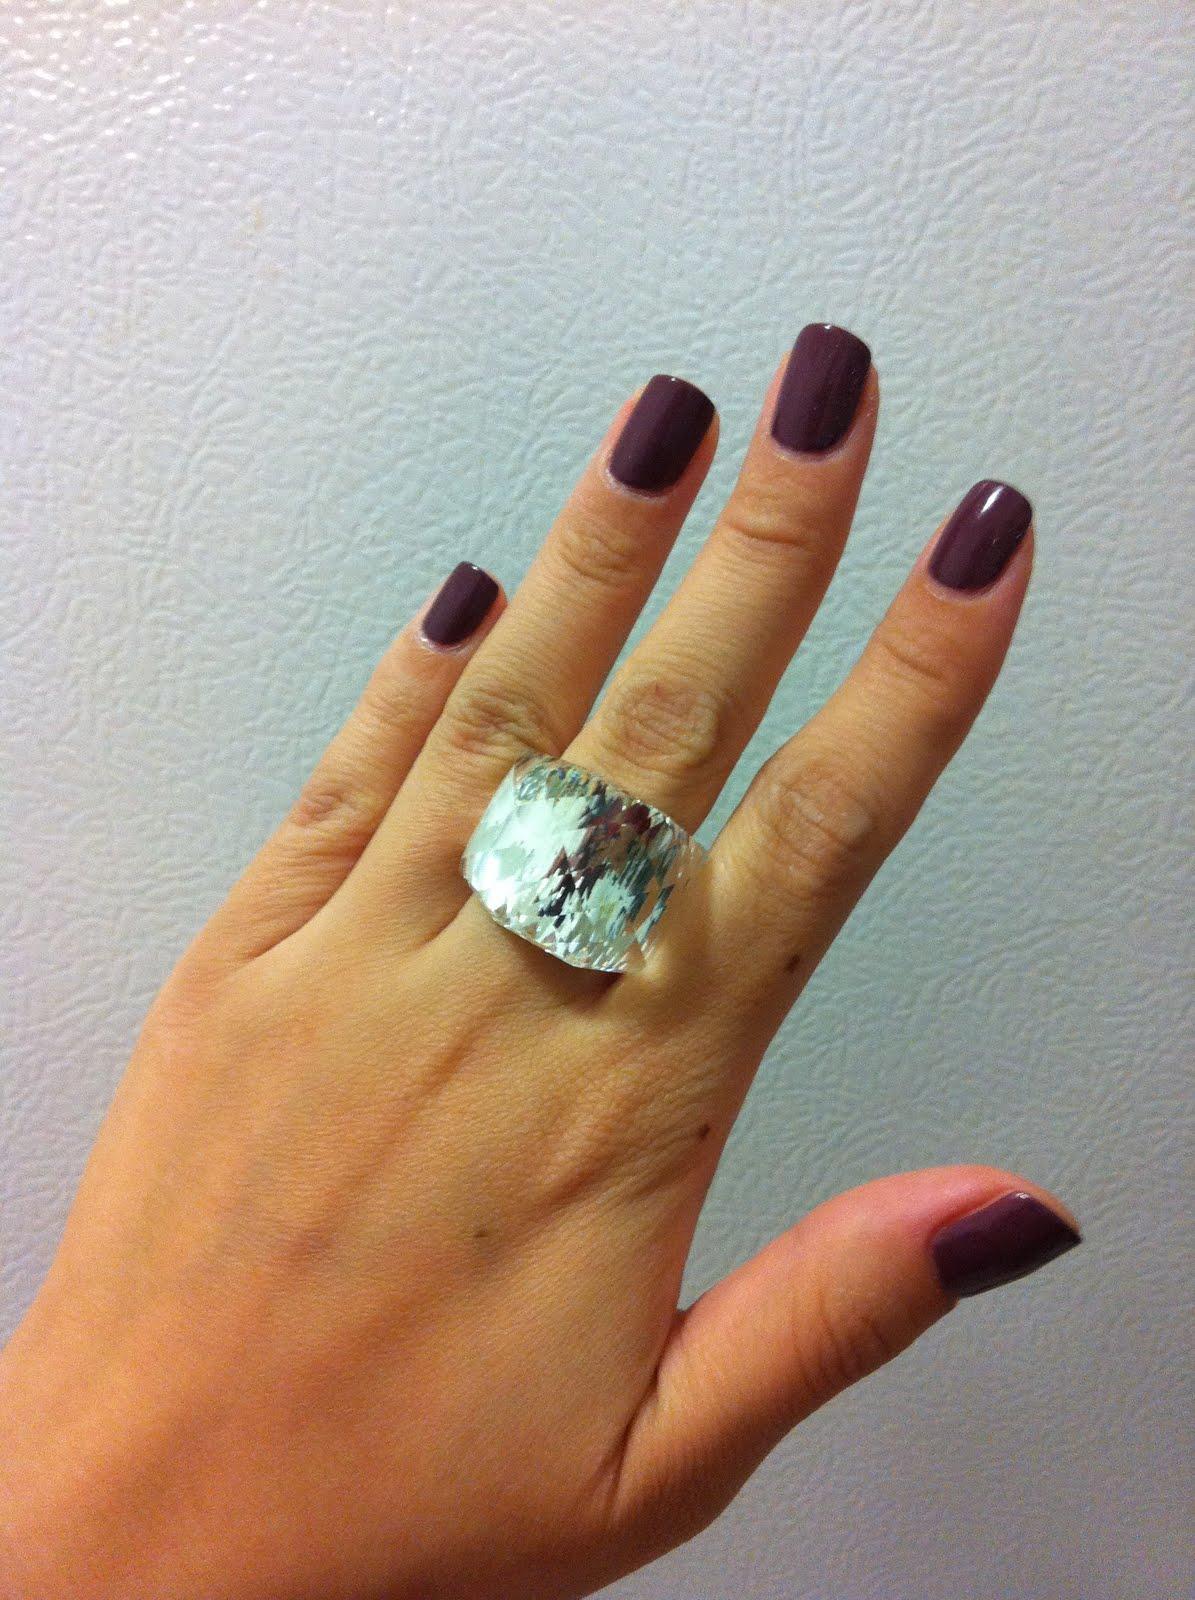 0498135ca0c7 girly girl diary  Favourite rings